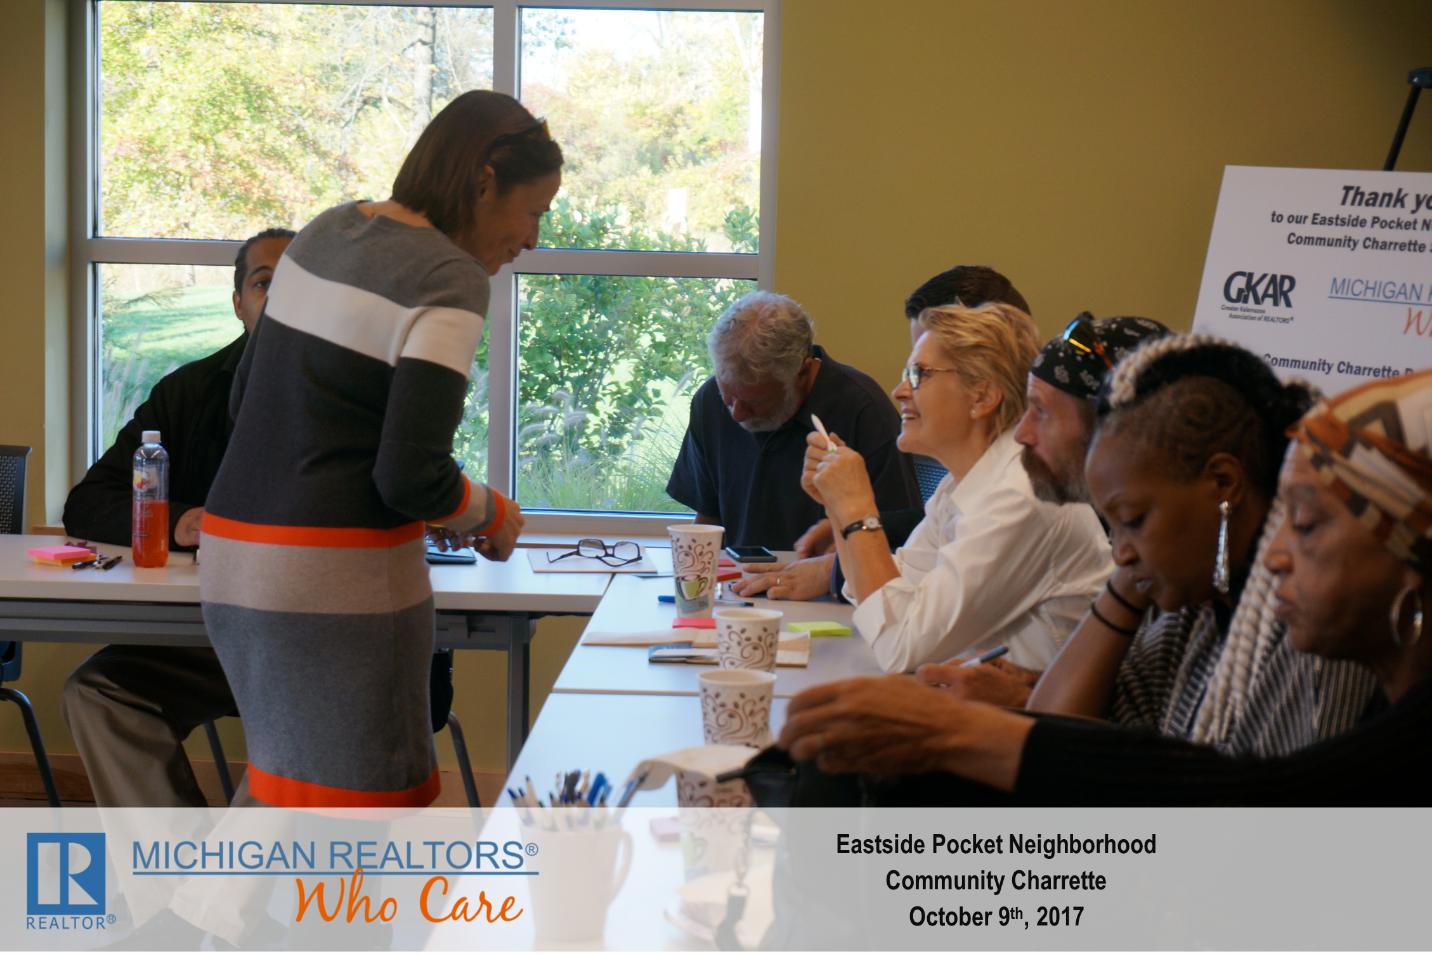 MI REALTORS Who Care Eastside Neighborhood Project Community Charette Oct 2017_2.png